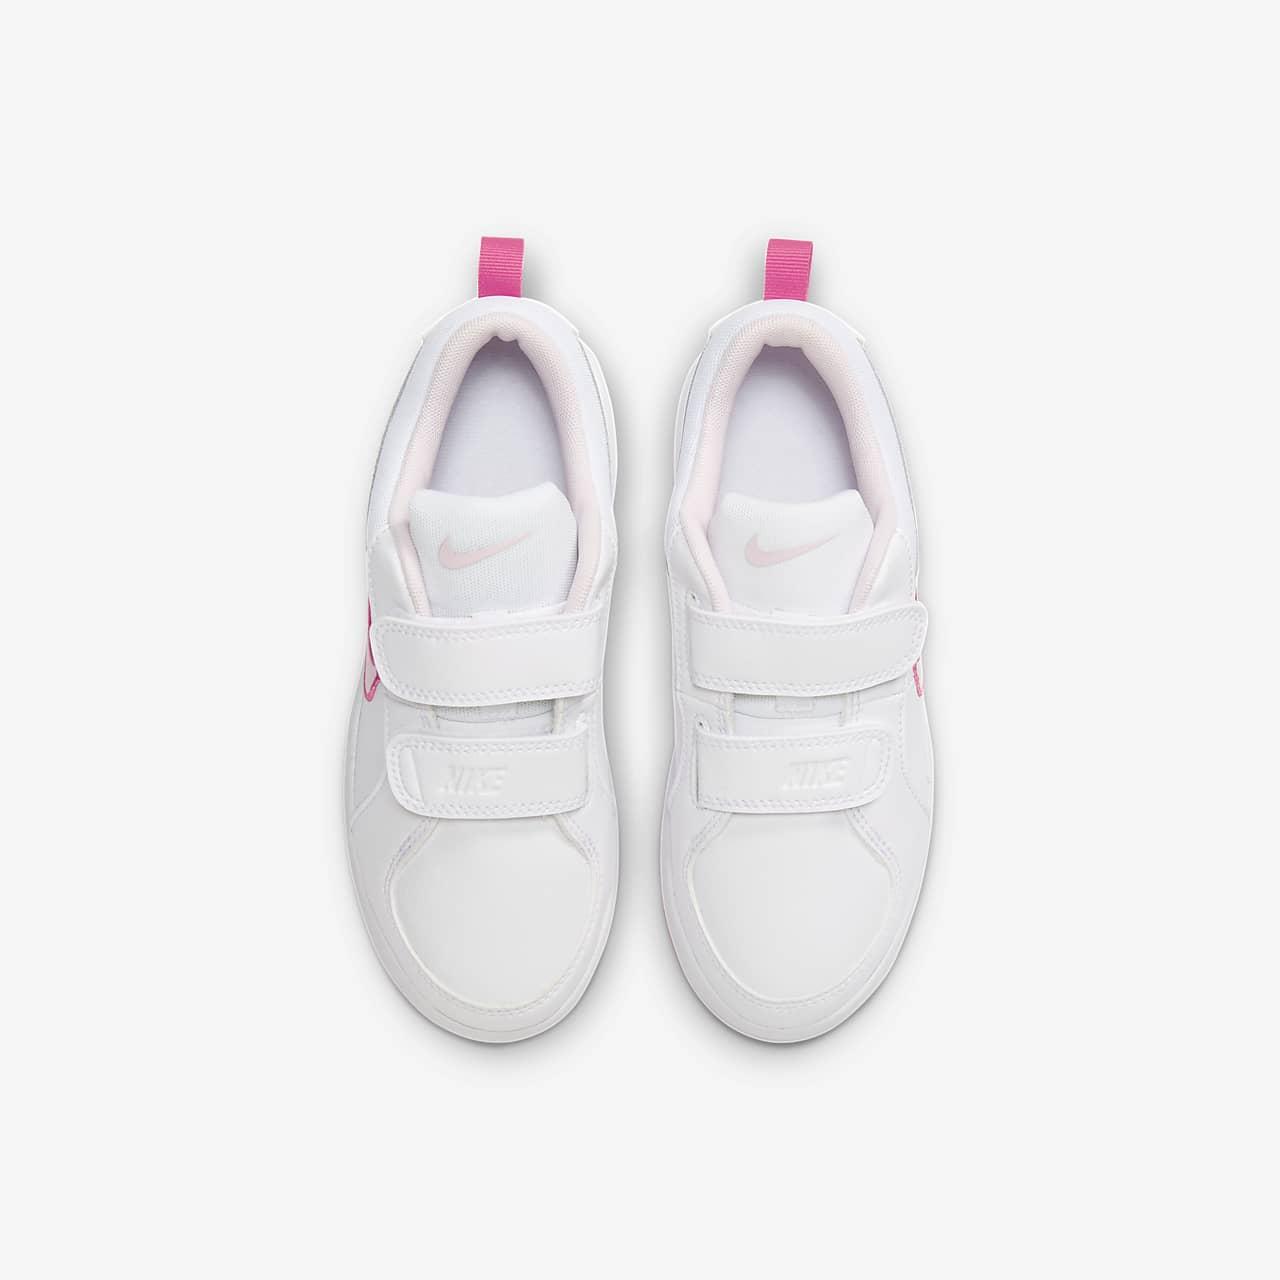 4 4 Nike Pico Nike Pico Nike 5A4RjL